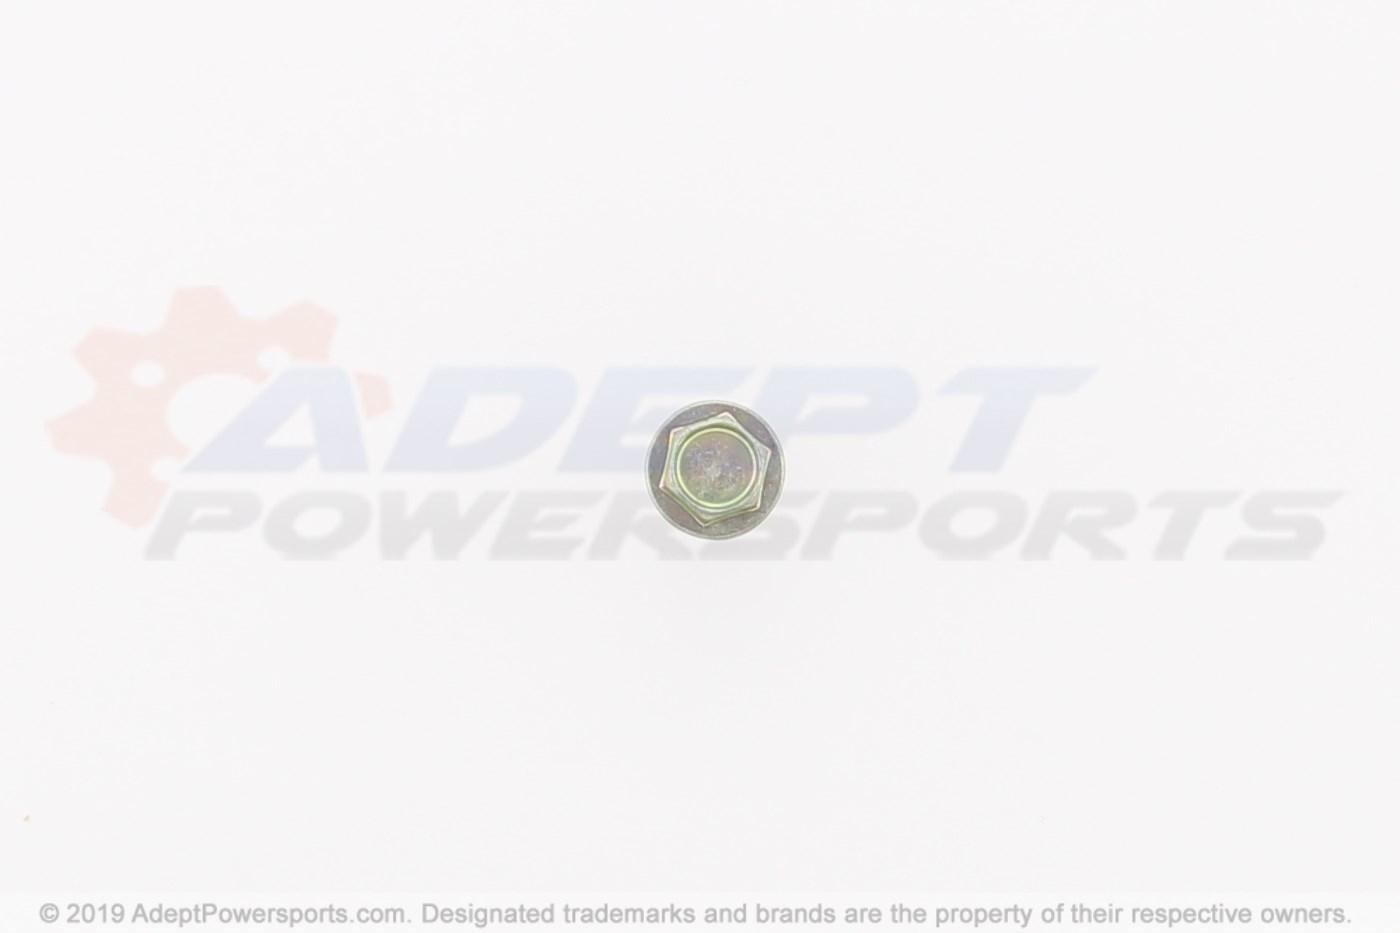 90020-438-000 Honda Bolt, Flange (6X20) $2.66